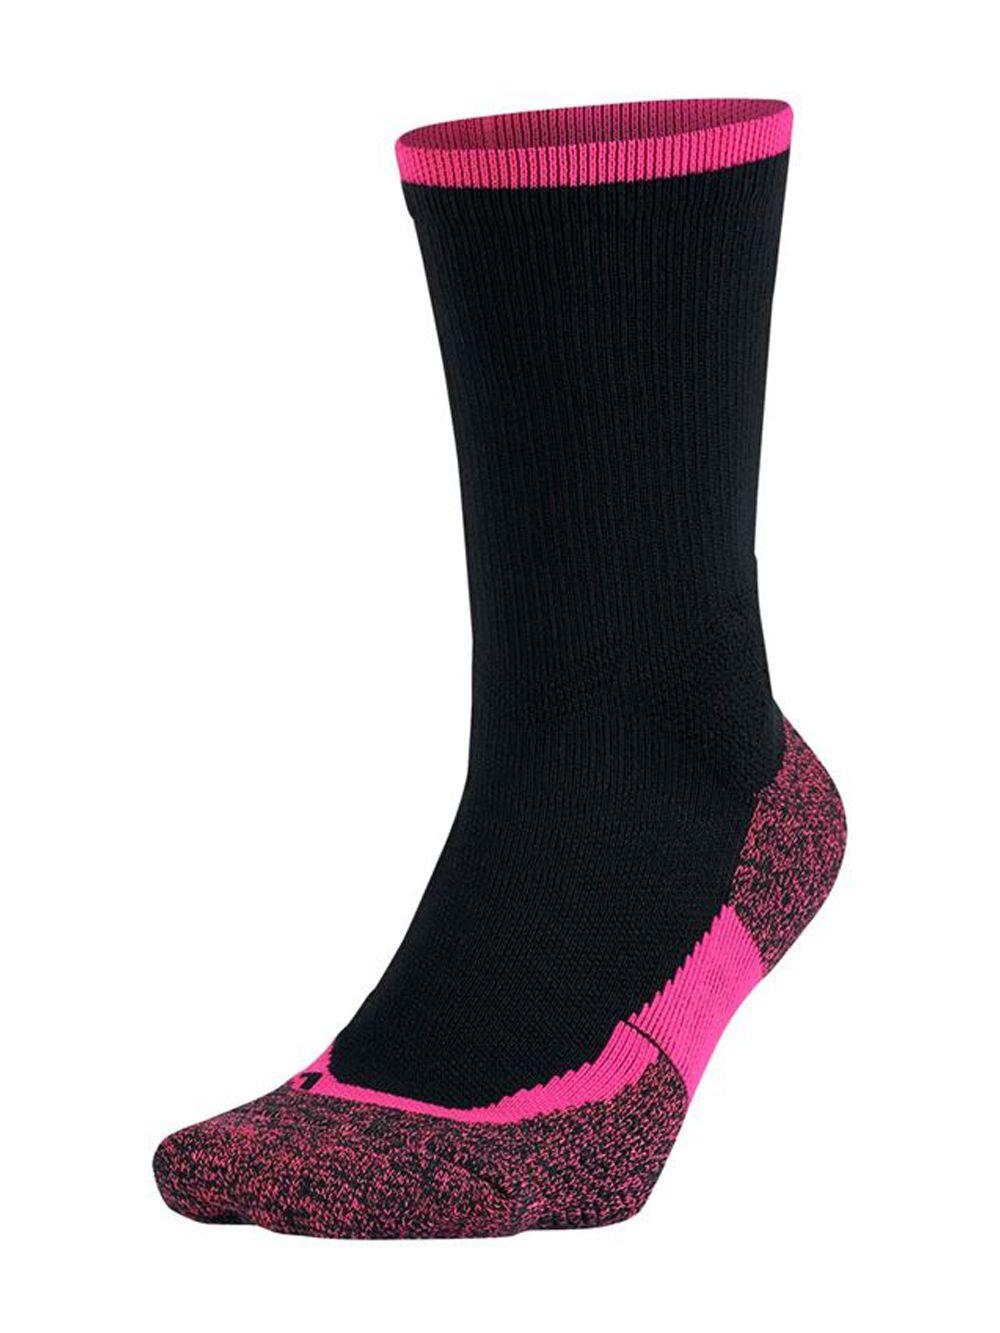 Pin On Socks